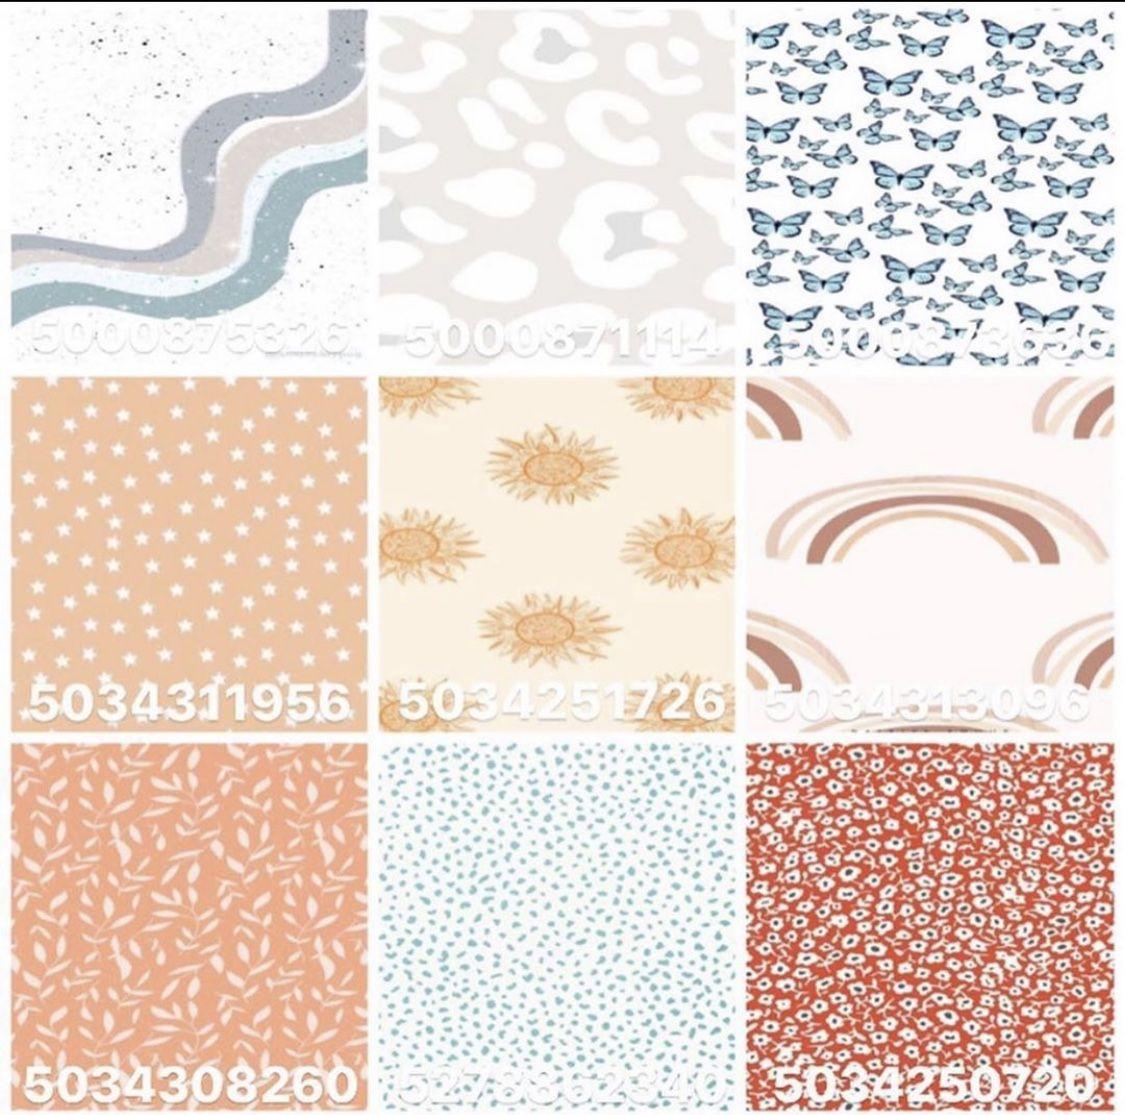 Roblox Painting Decal In 2020 Custom Decals Room Decals Code Wallpaper